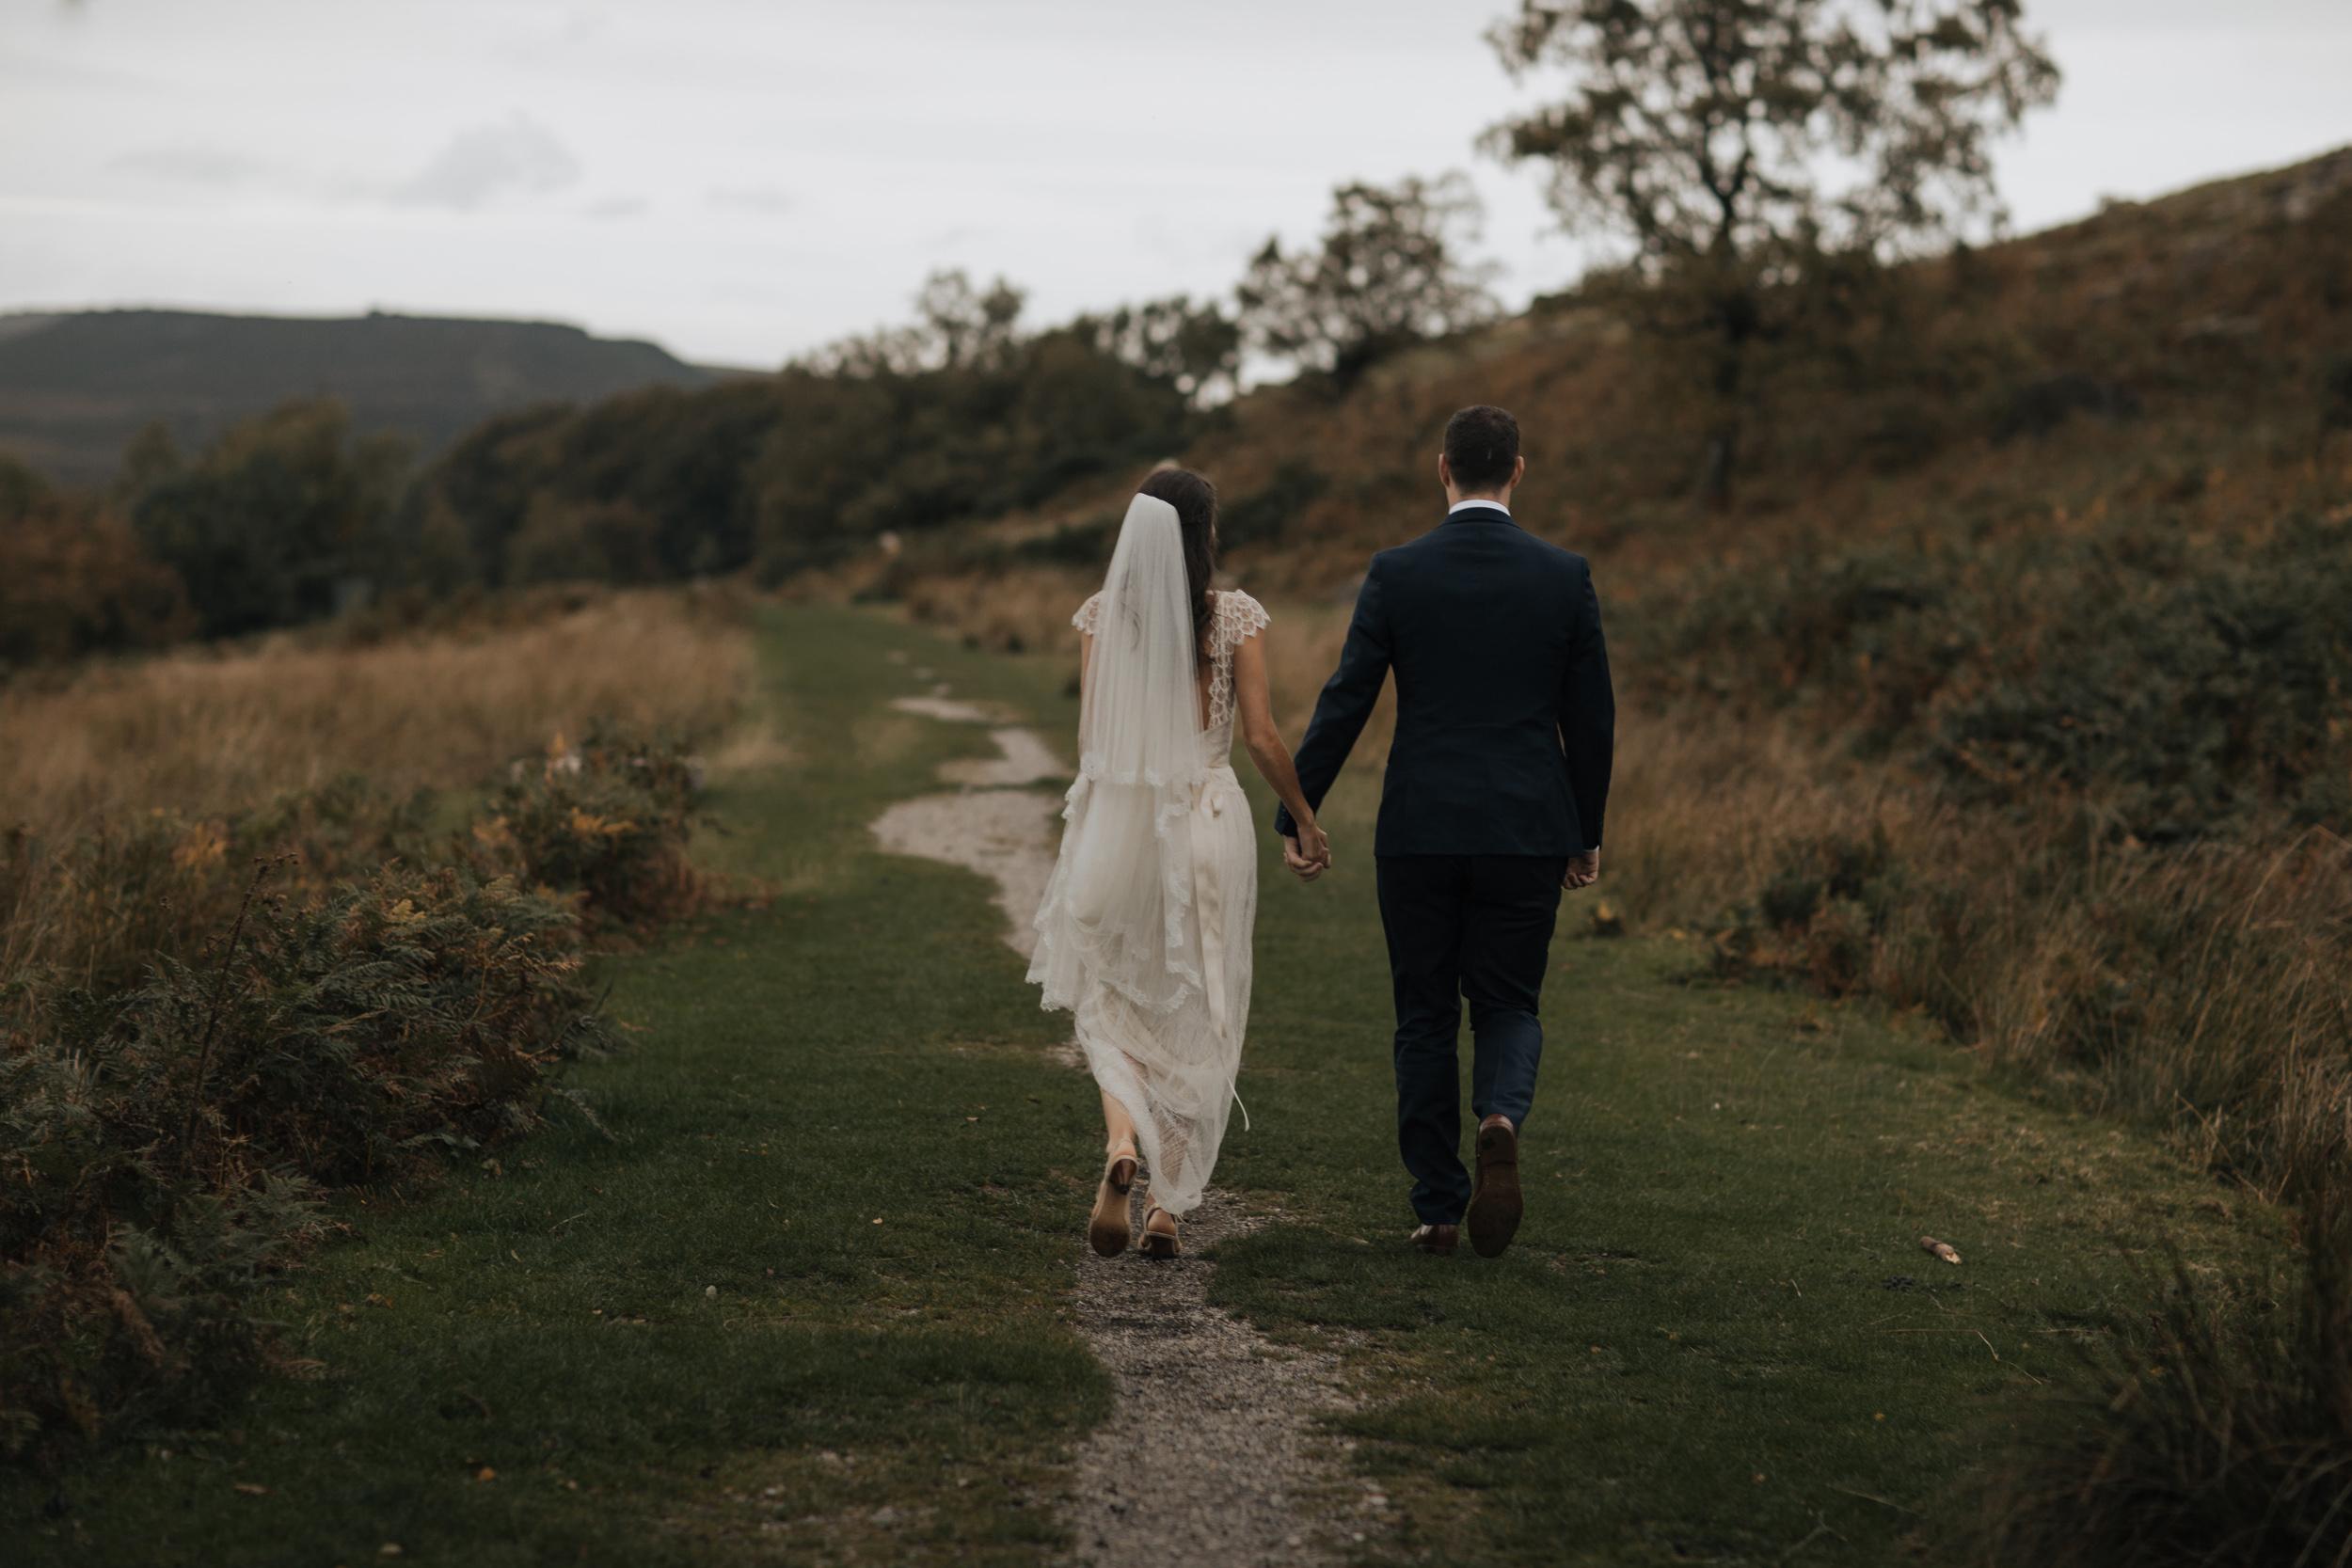 Joasia-Kate-Beaumont-Bohemian-Lace-Wedding-Dress-Peak-District-Sheffield-Wedding-22.jpg